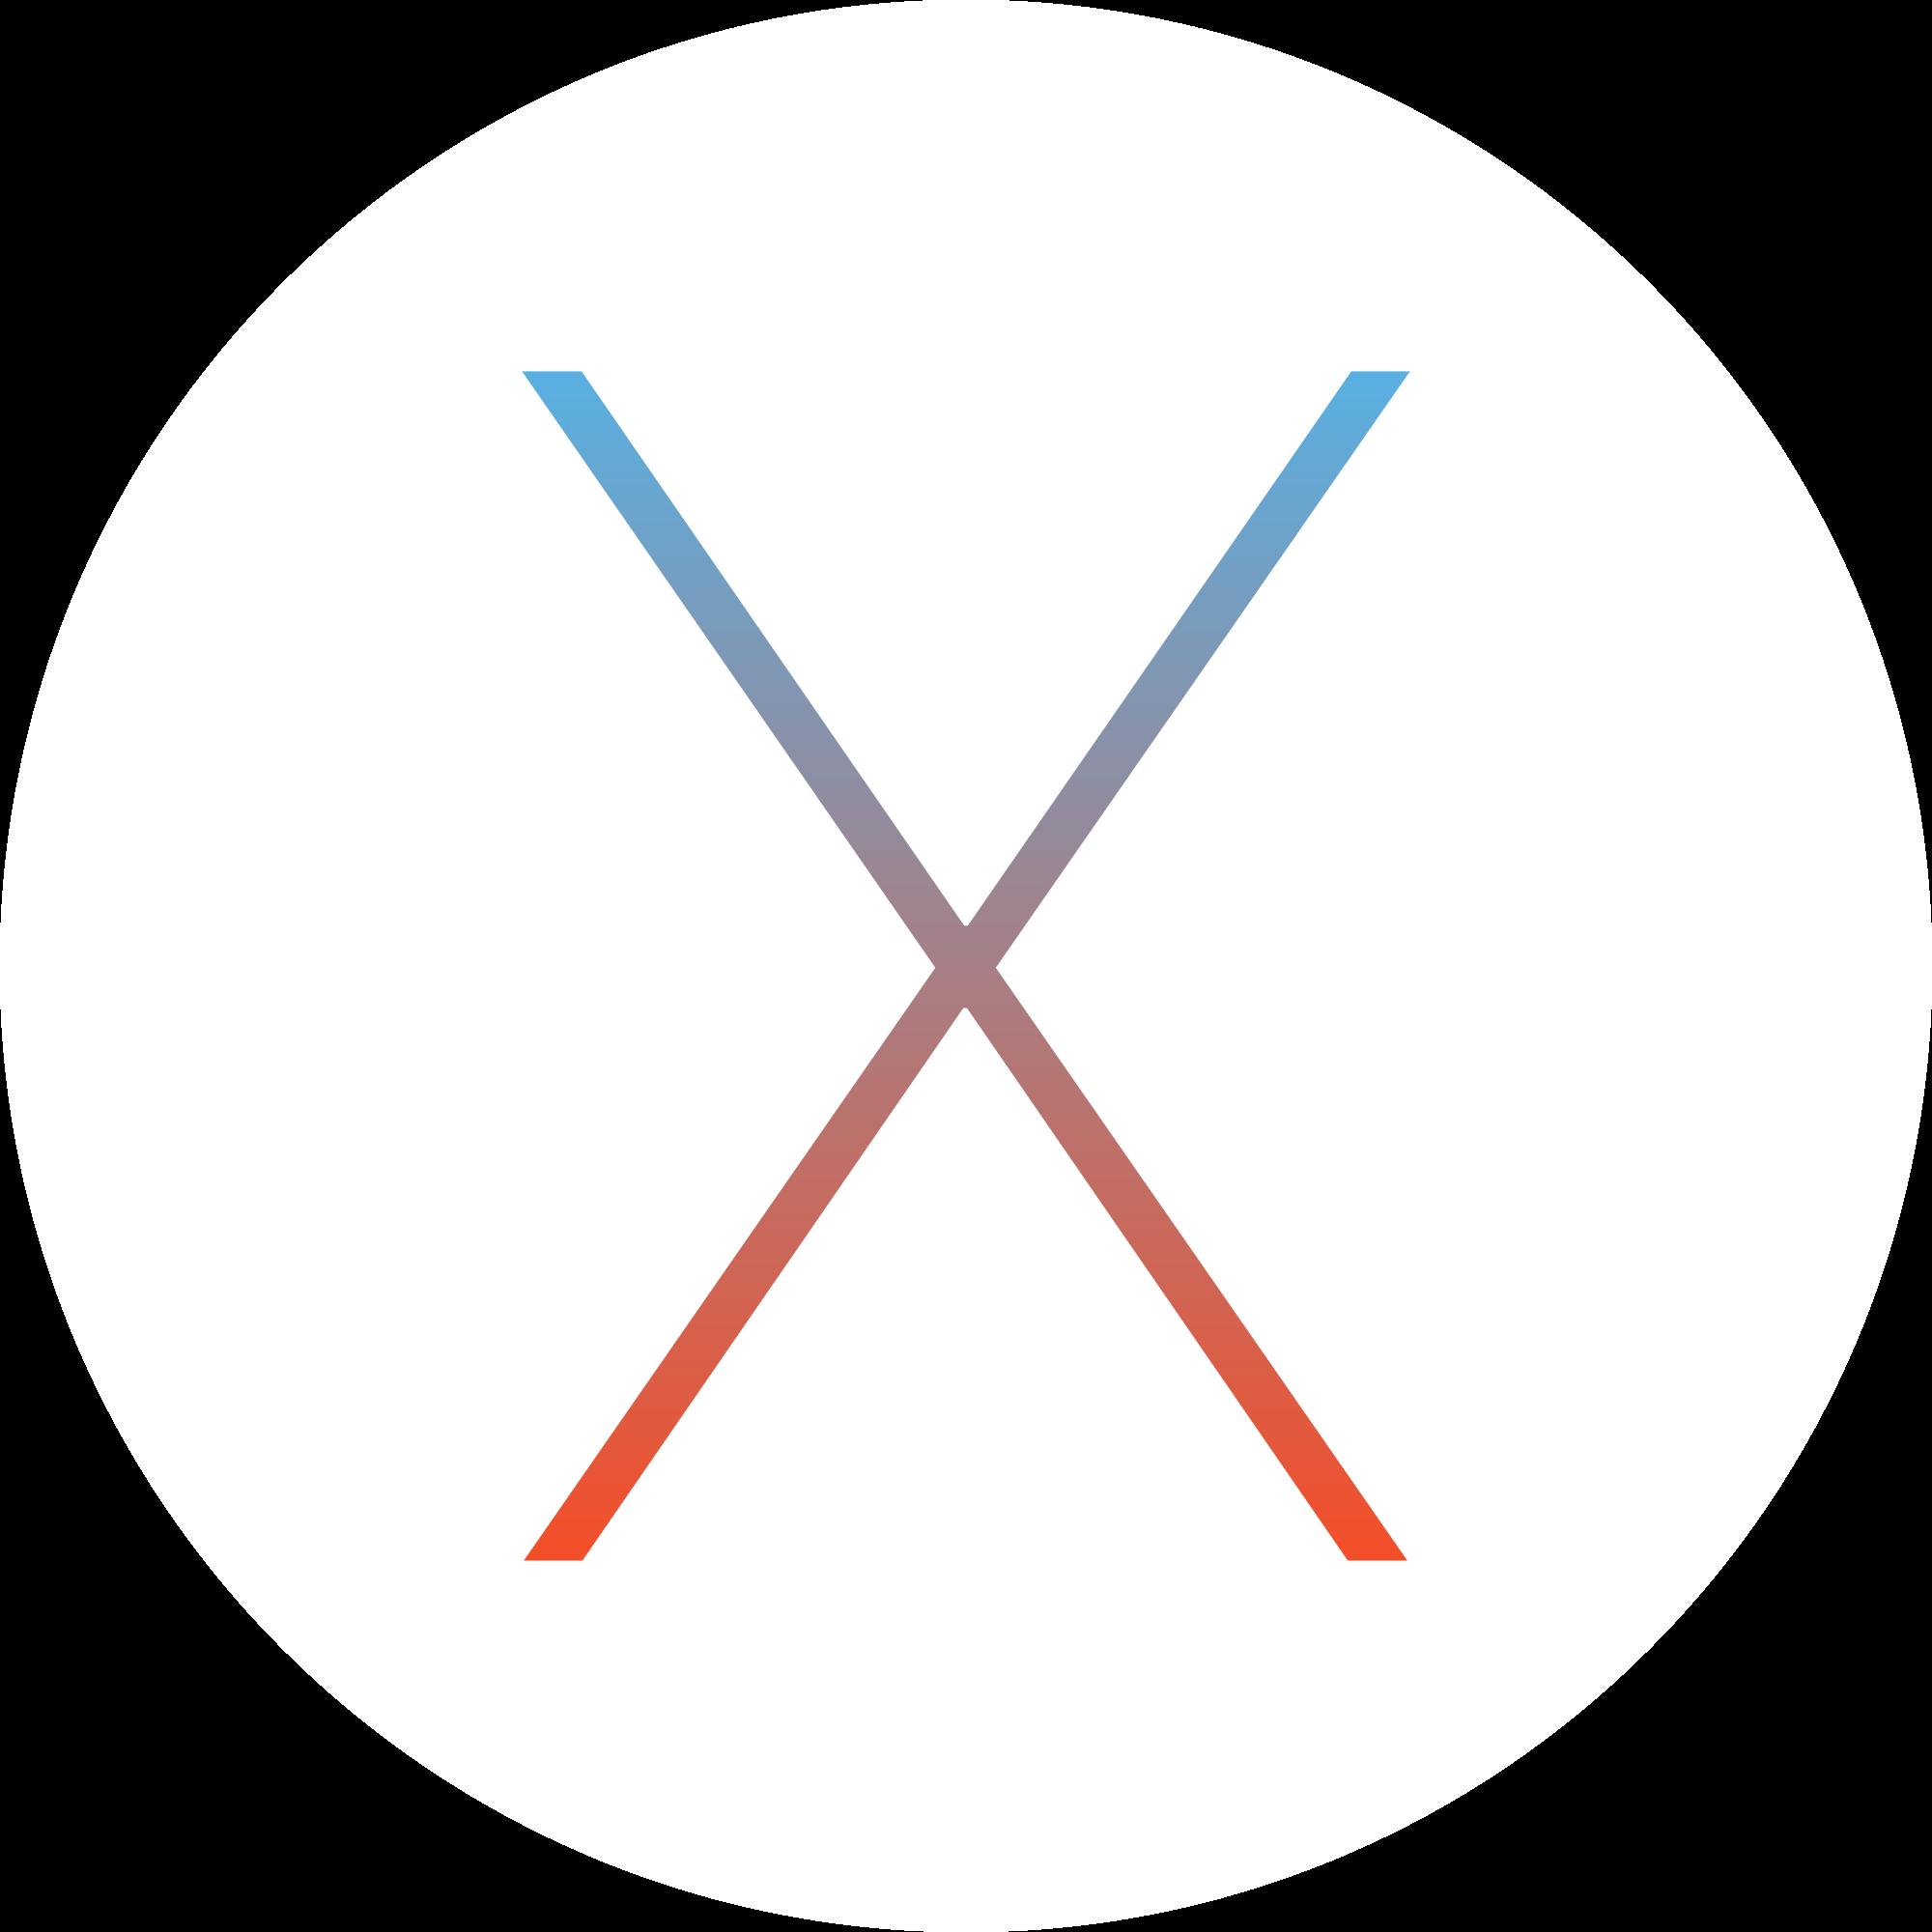 Free Mac OS X PNG Transparent Images, Do #242939.